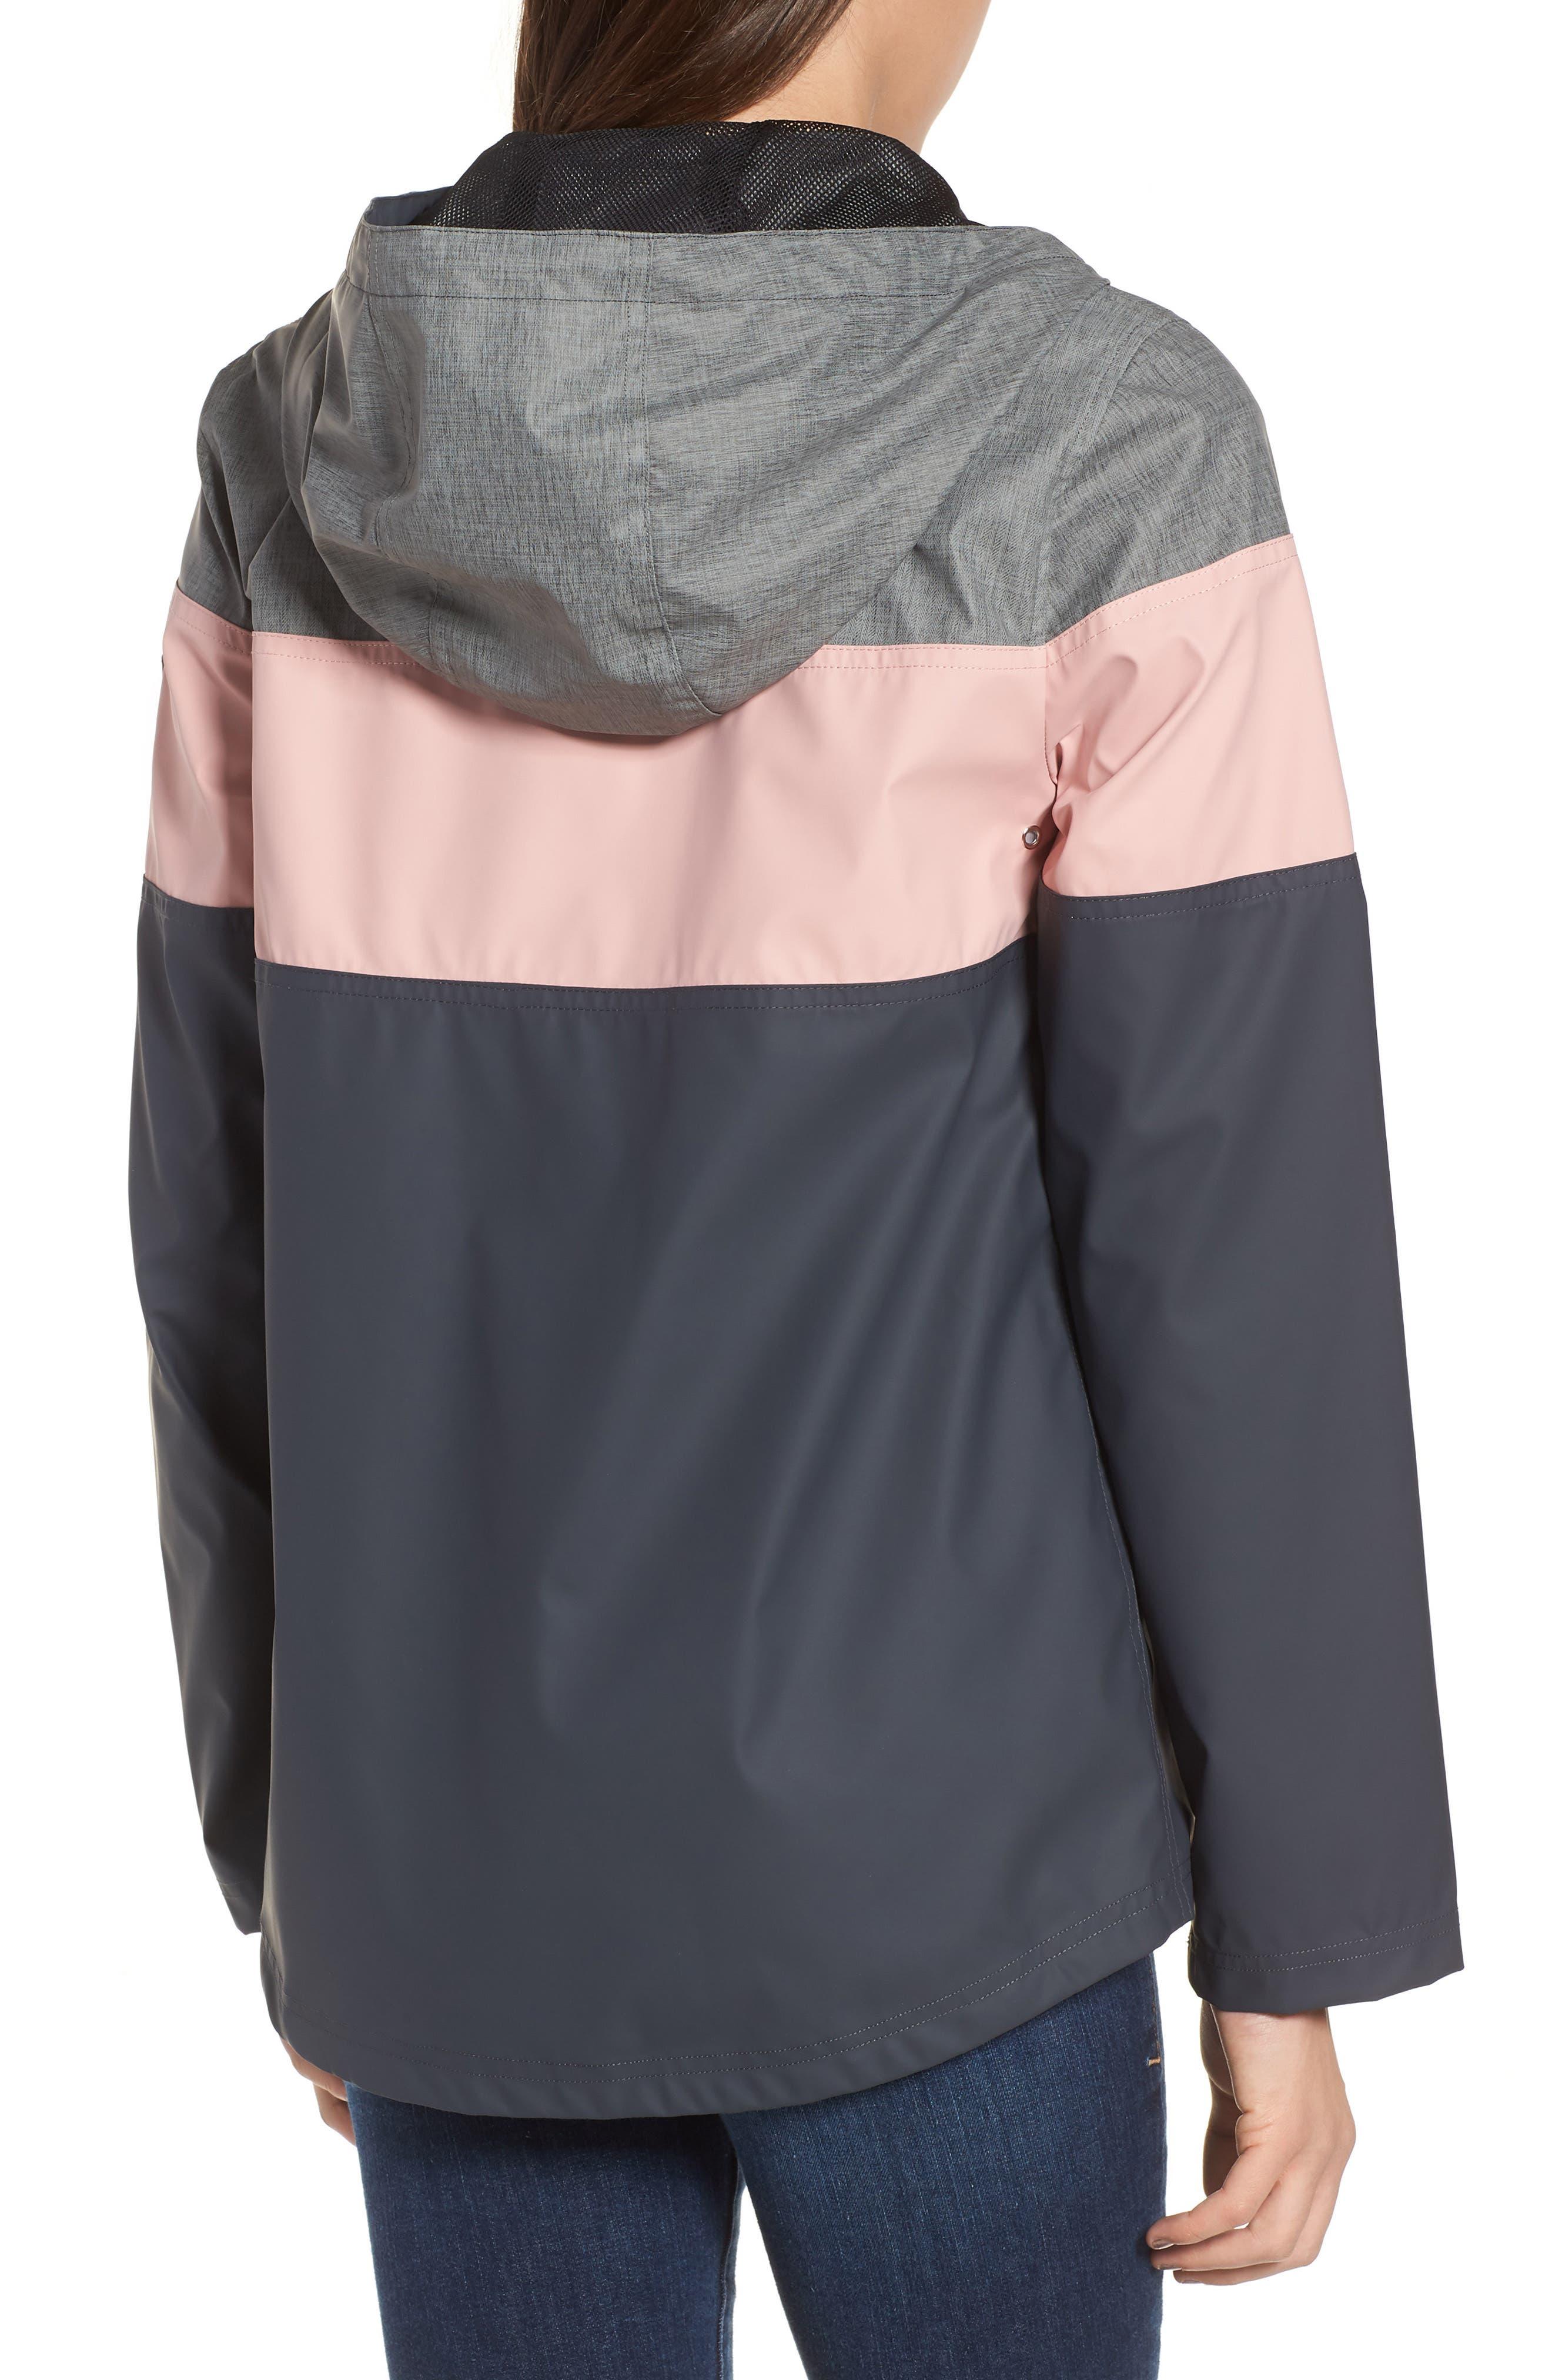 Hooded Raincoat,                             Alternate thumbnail 2, color,                             Storm/ Blush/ Mech Grey